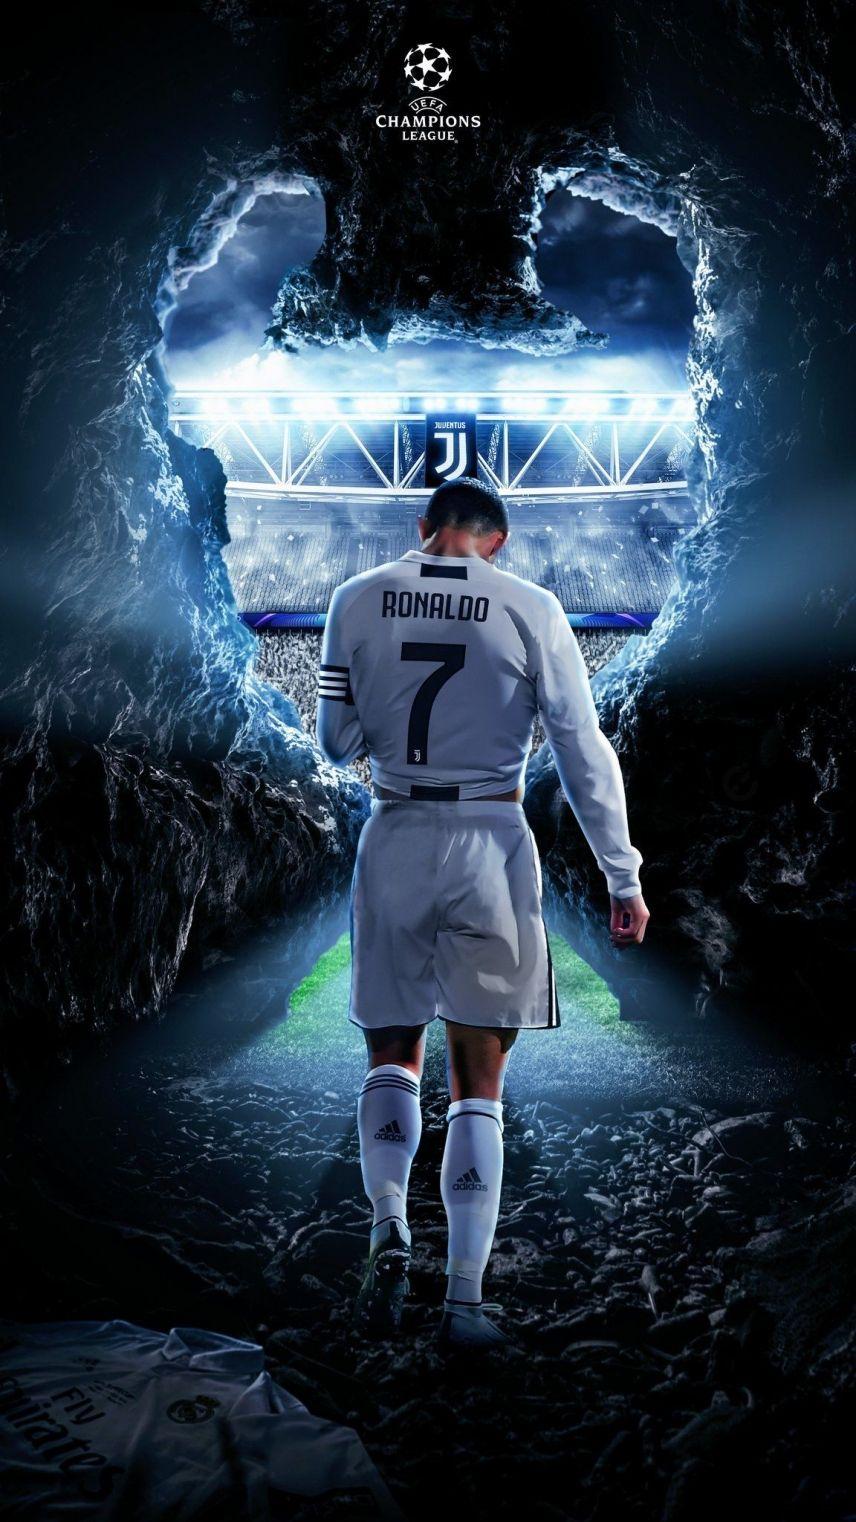 44 Cristiano Ronaldo Hd 2020 Wallpapers On Wallpapersafari